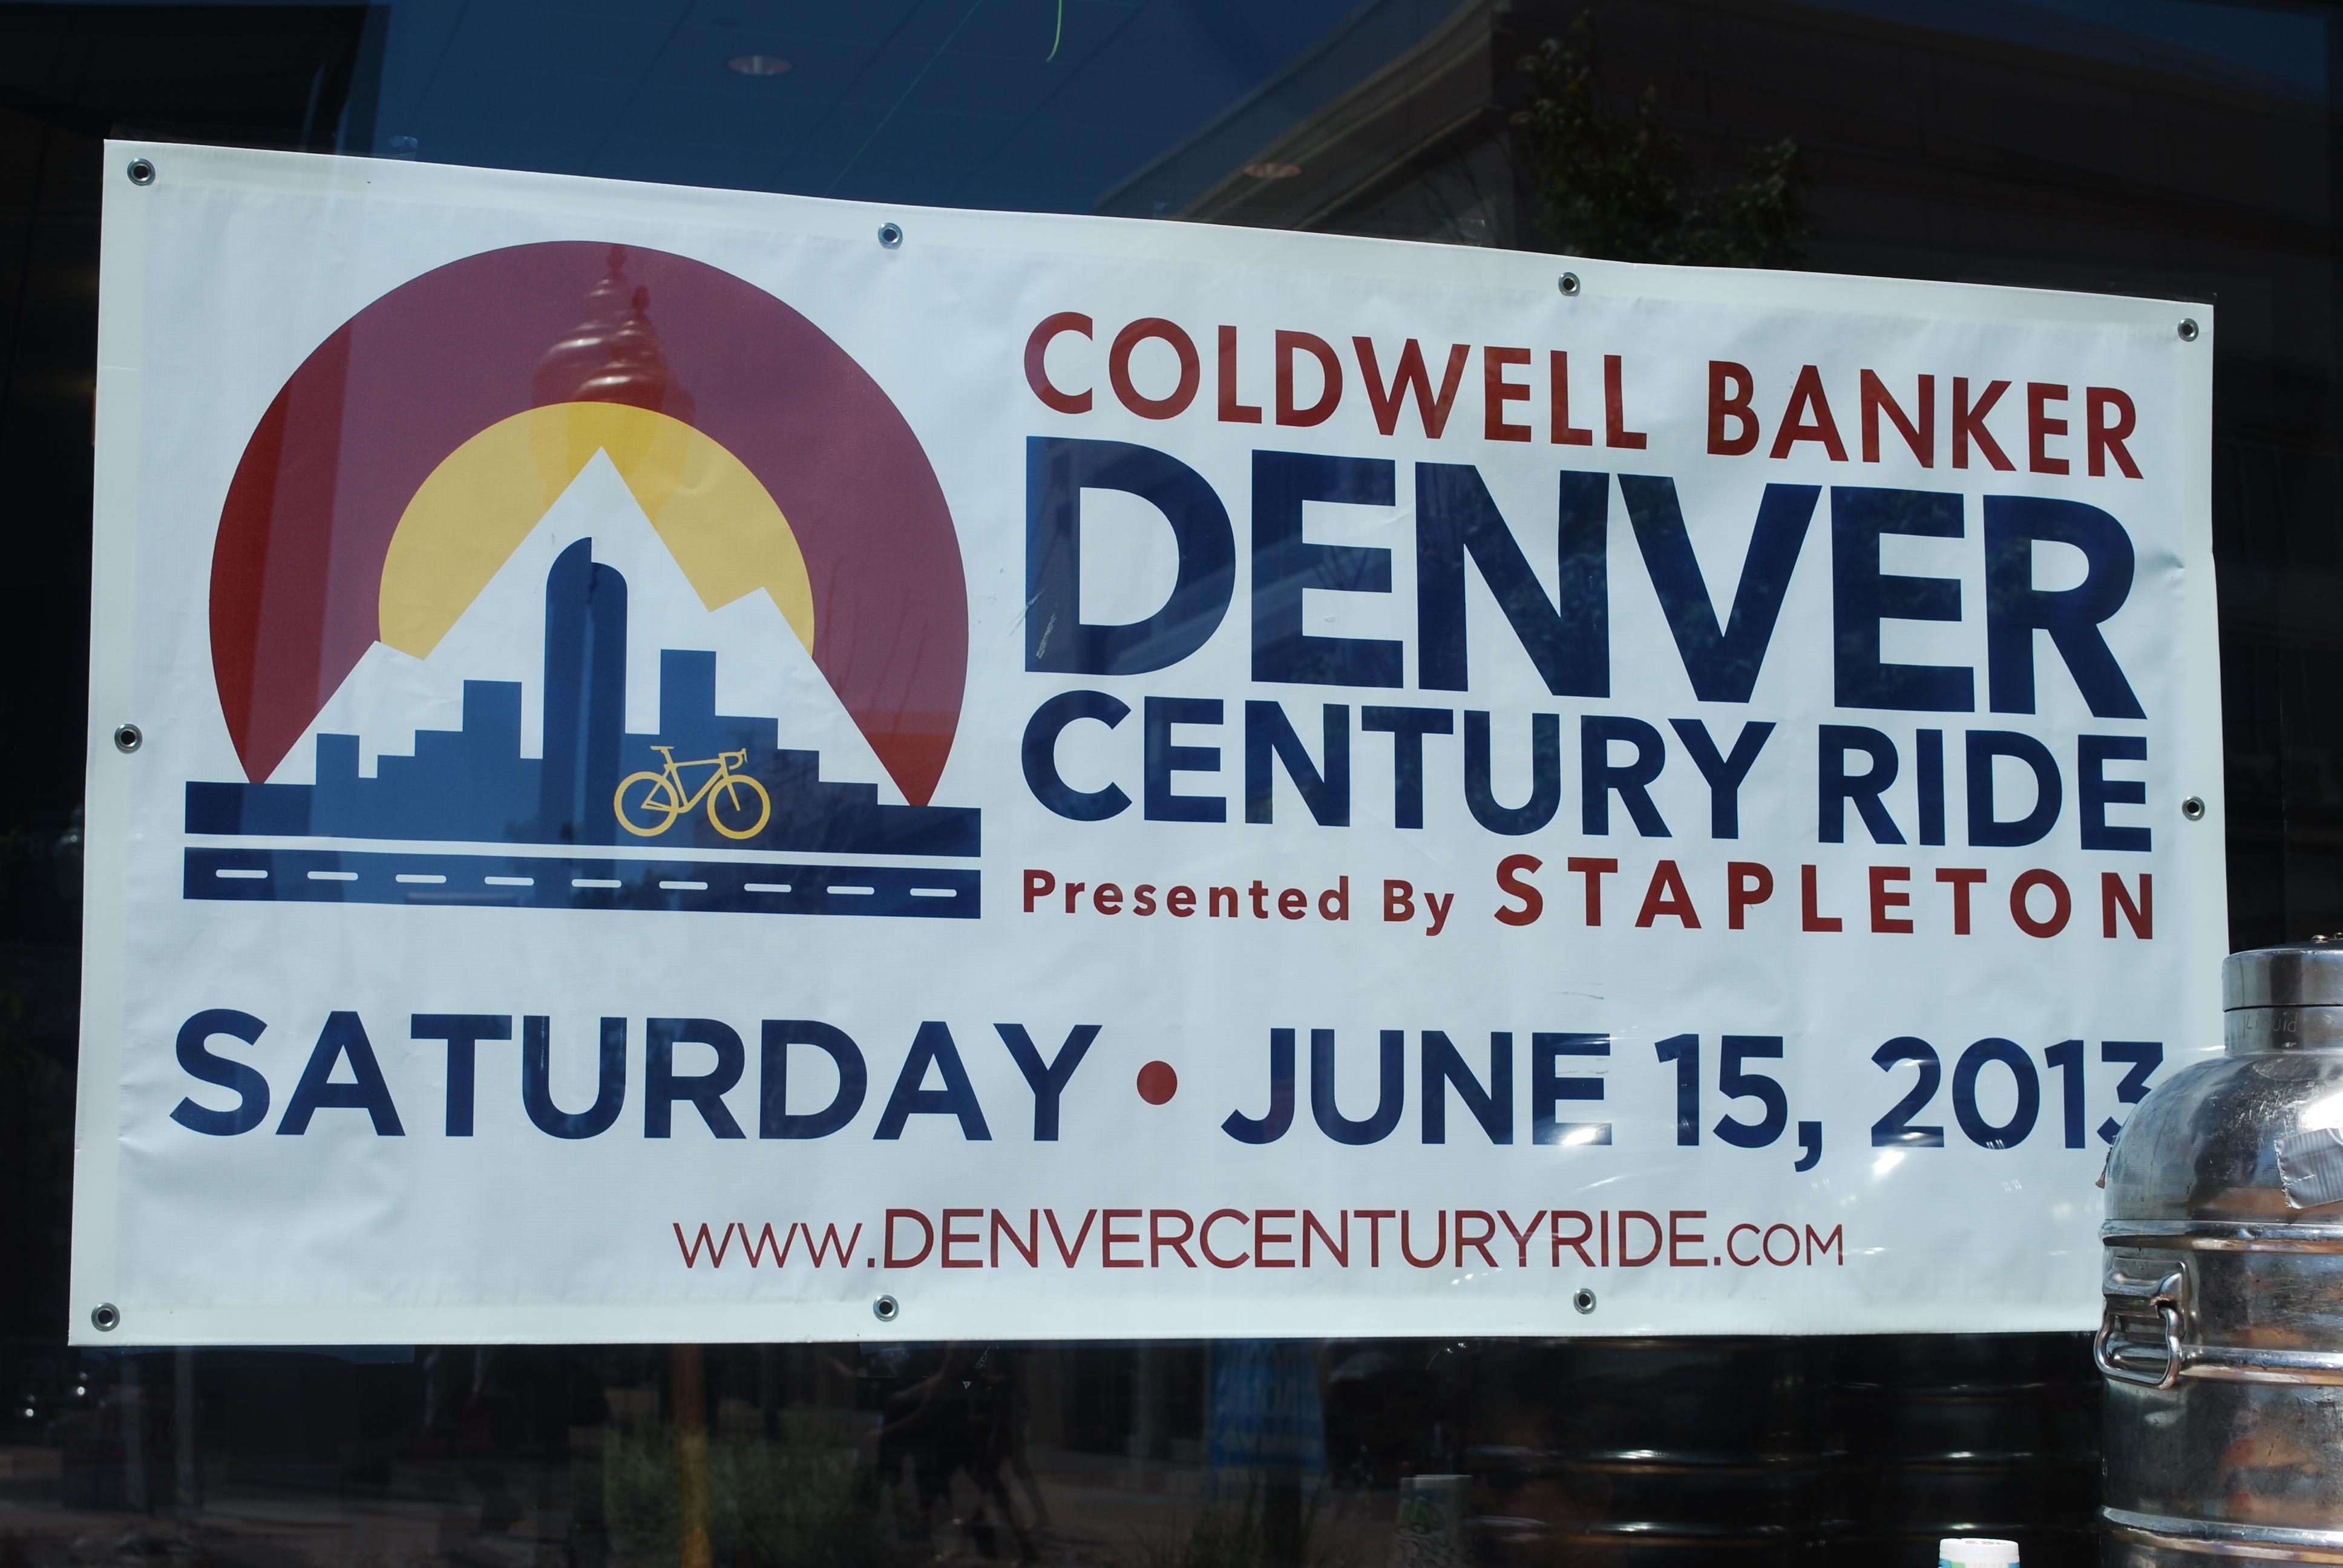 Denver Century Ride 1 1